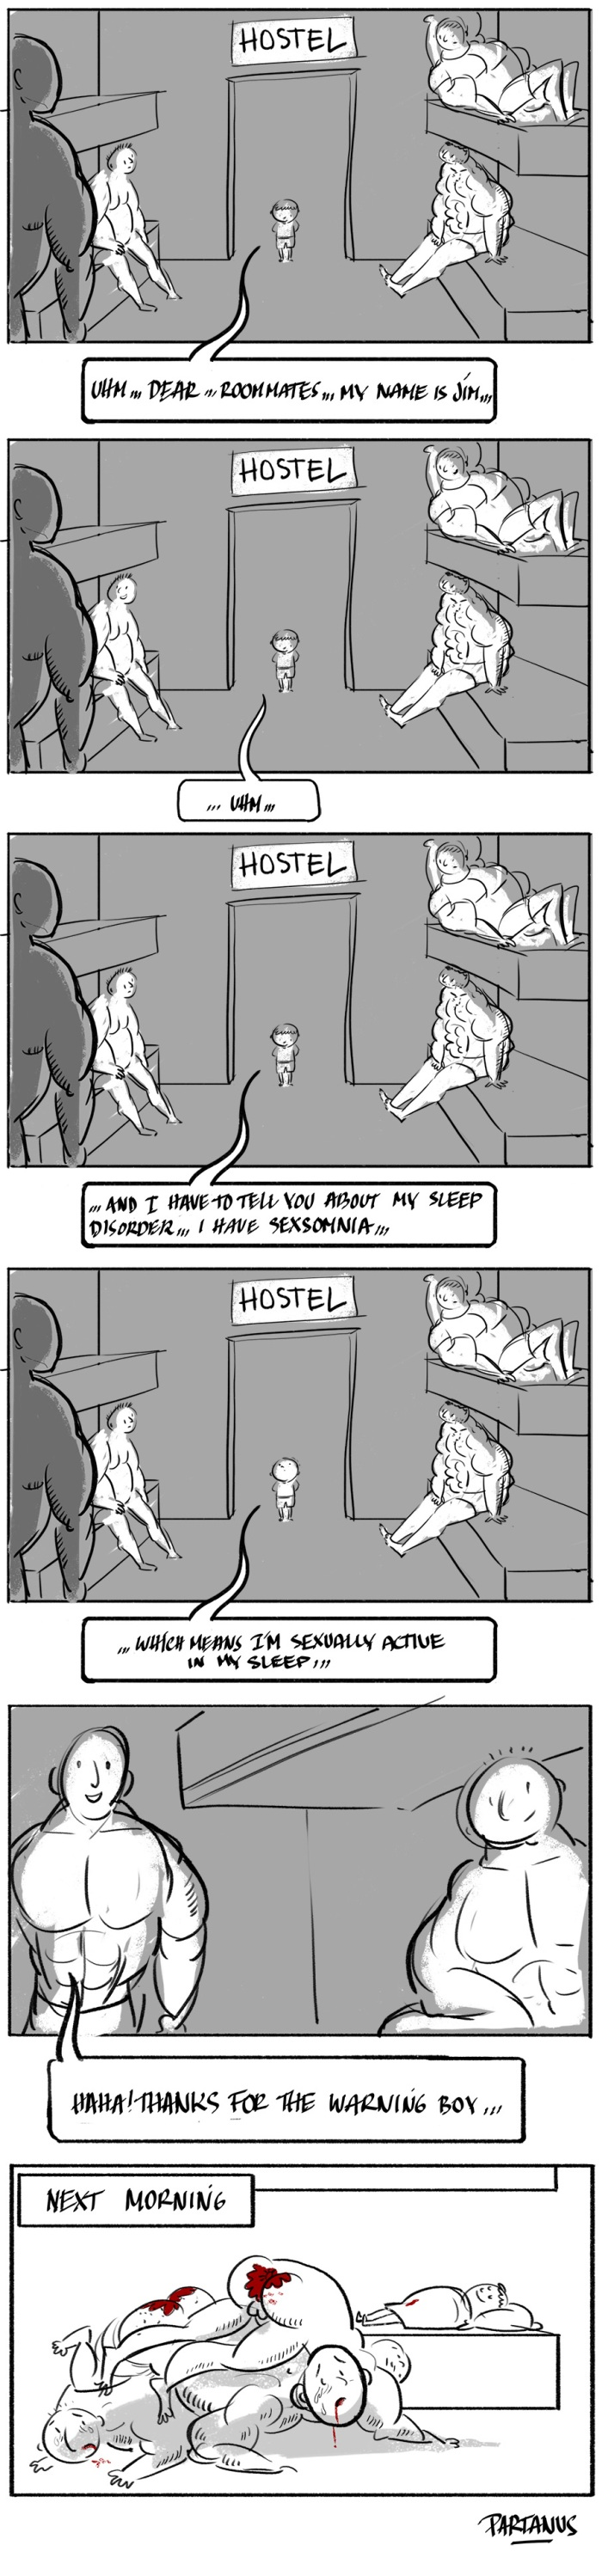 hostel, sex, sexsomnia, sleep disorder, dorm